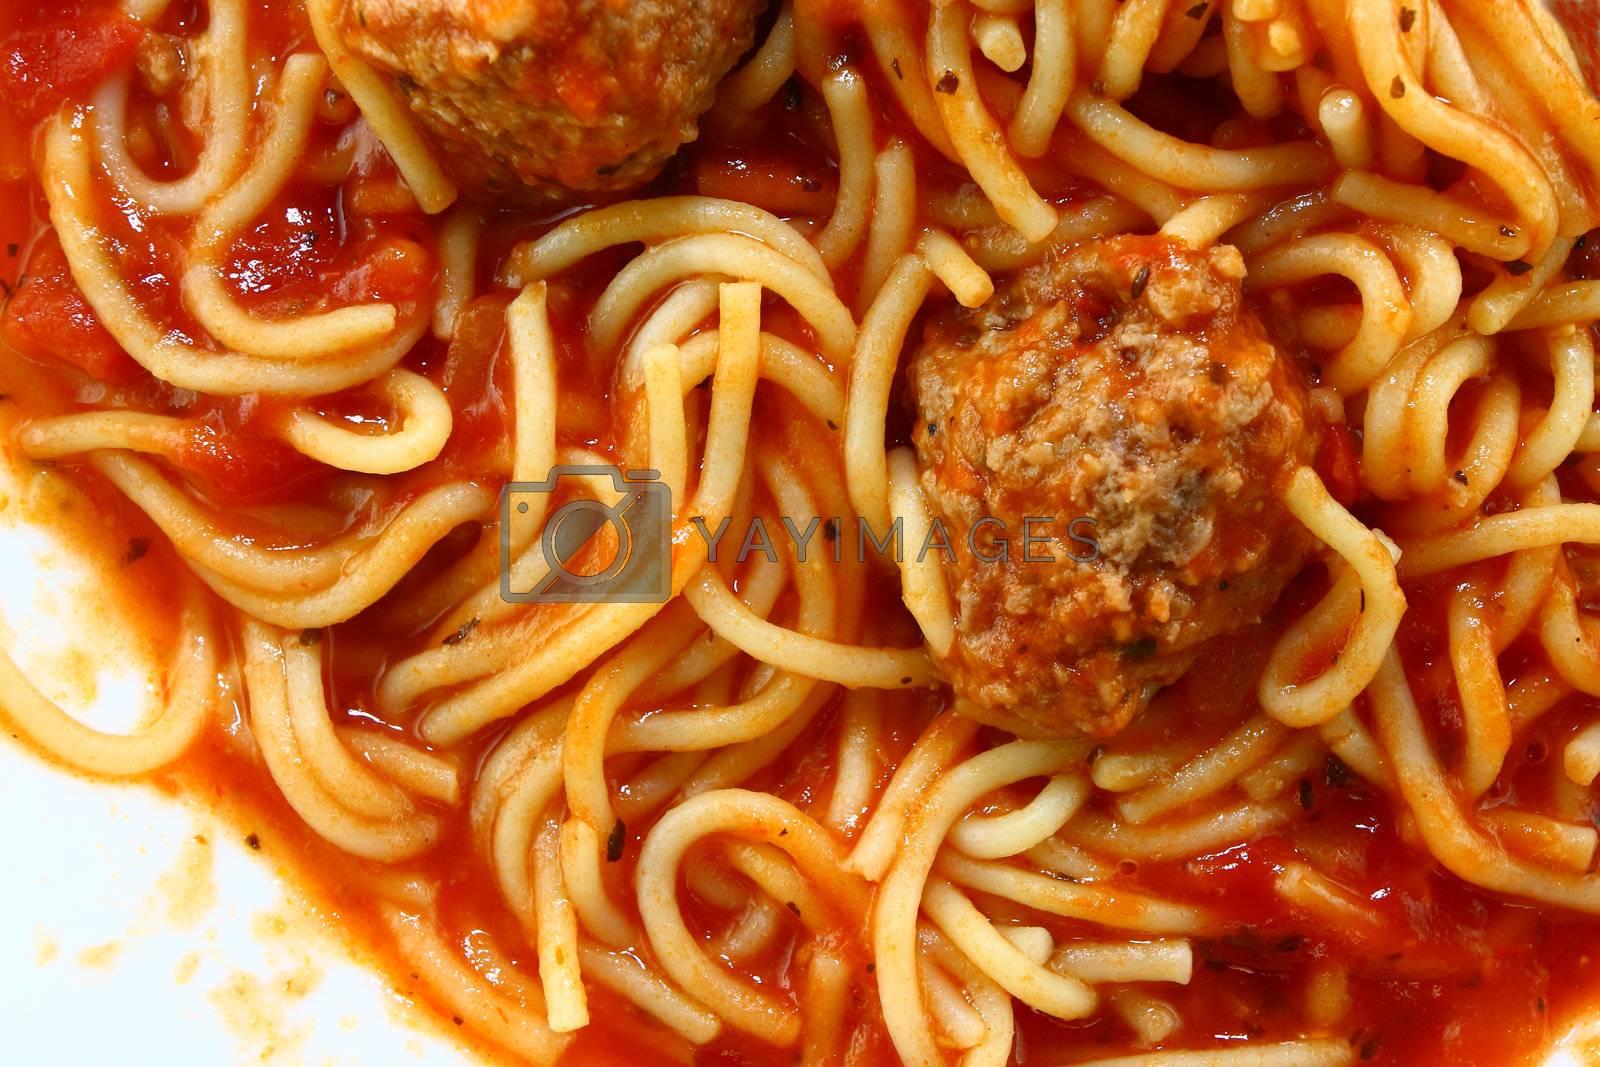 Spaghetti macro, overhead shot.